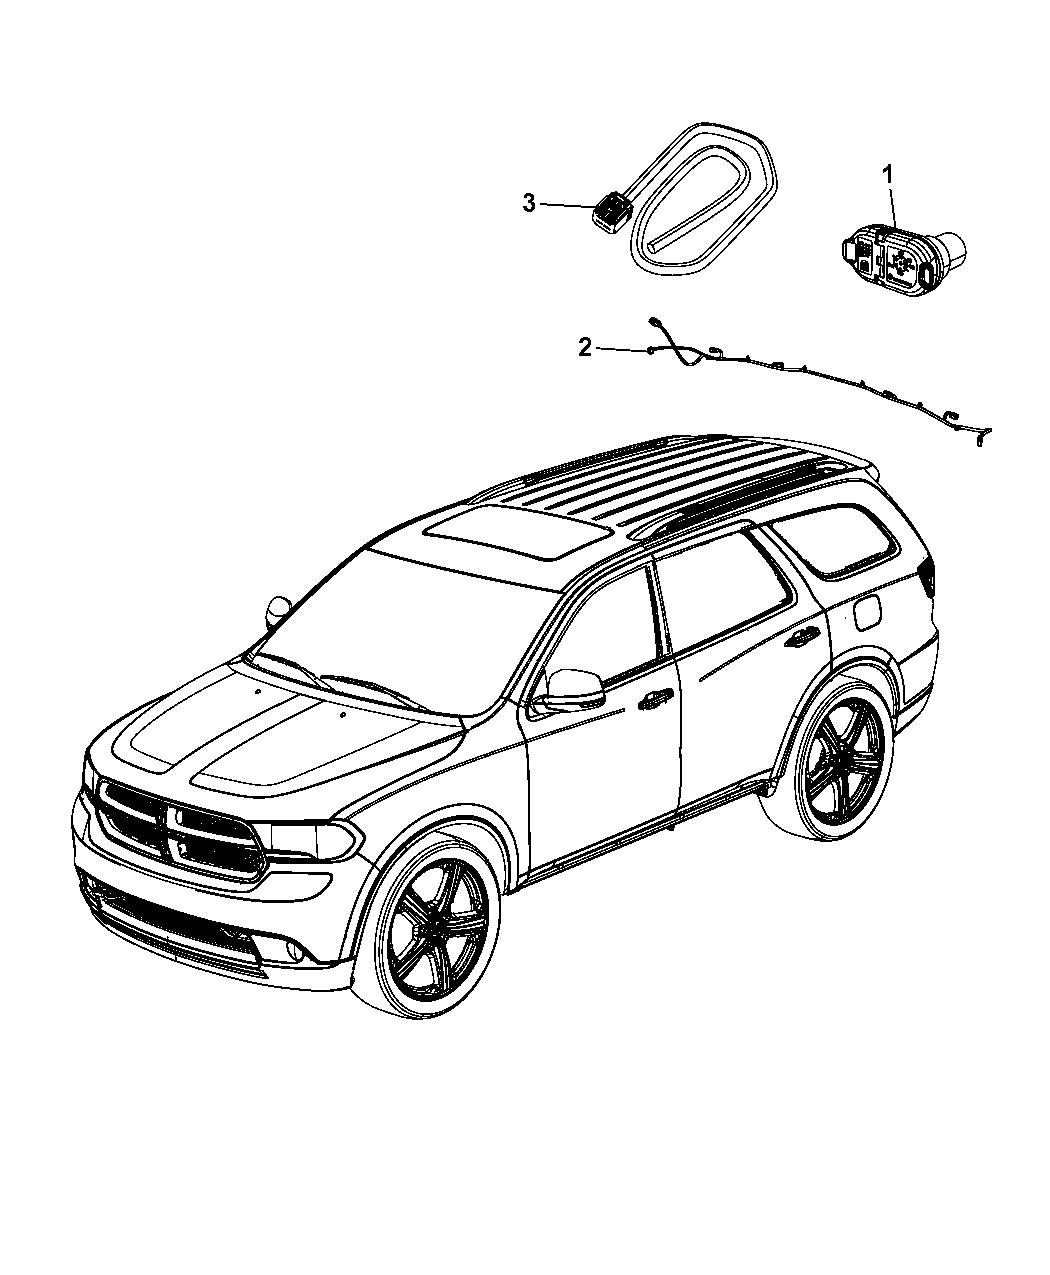 68088278aa Genuine Dodge Wiring Ki Trailer Tow